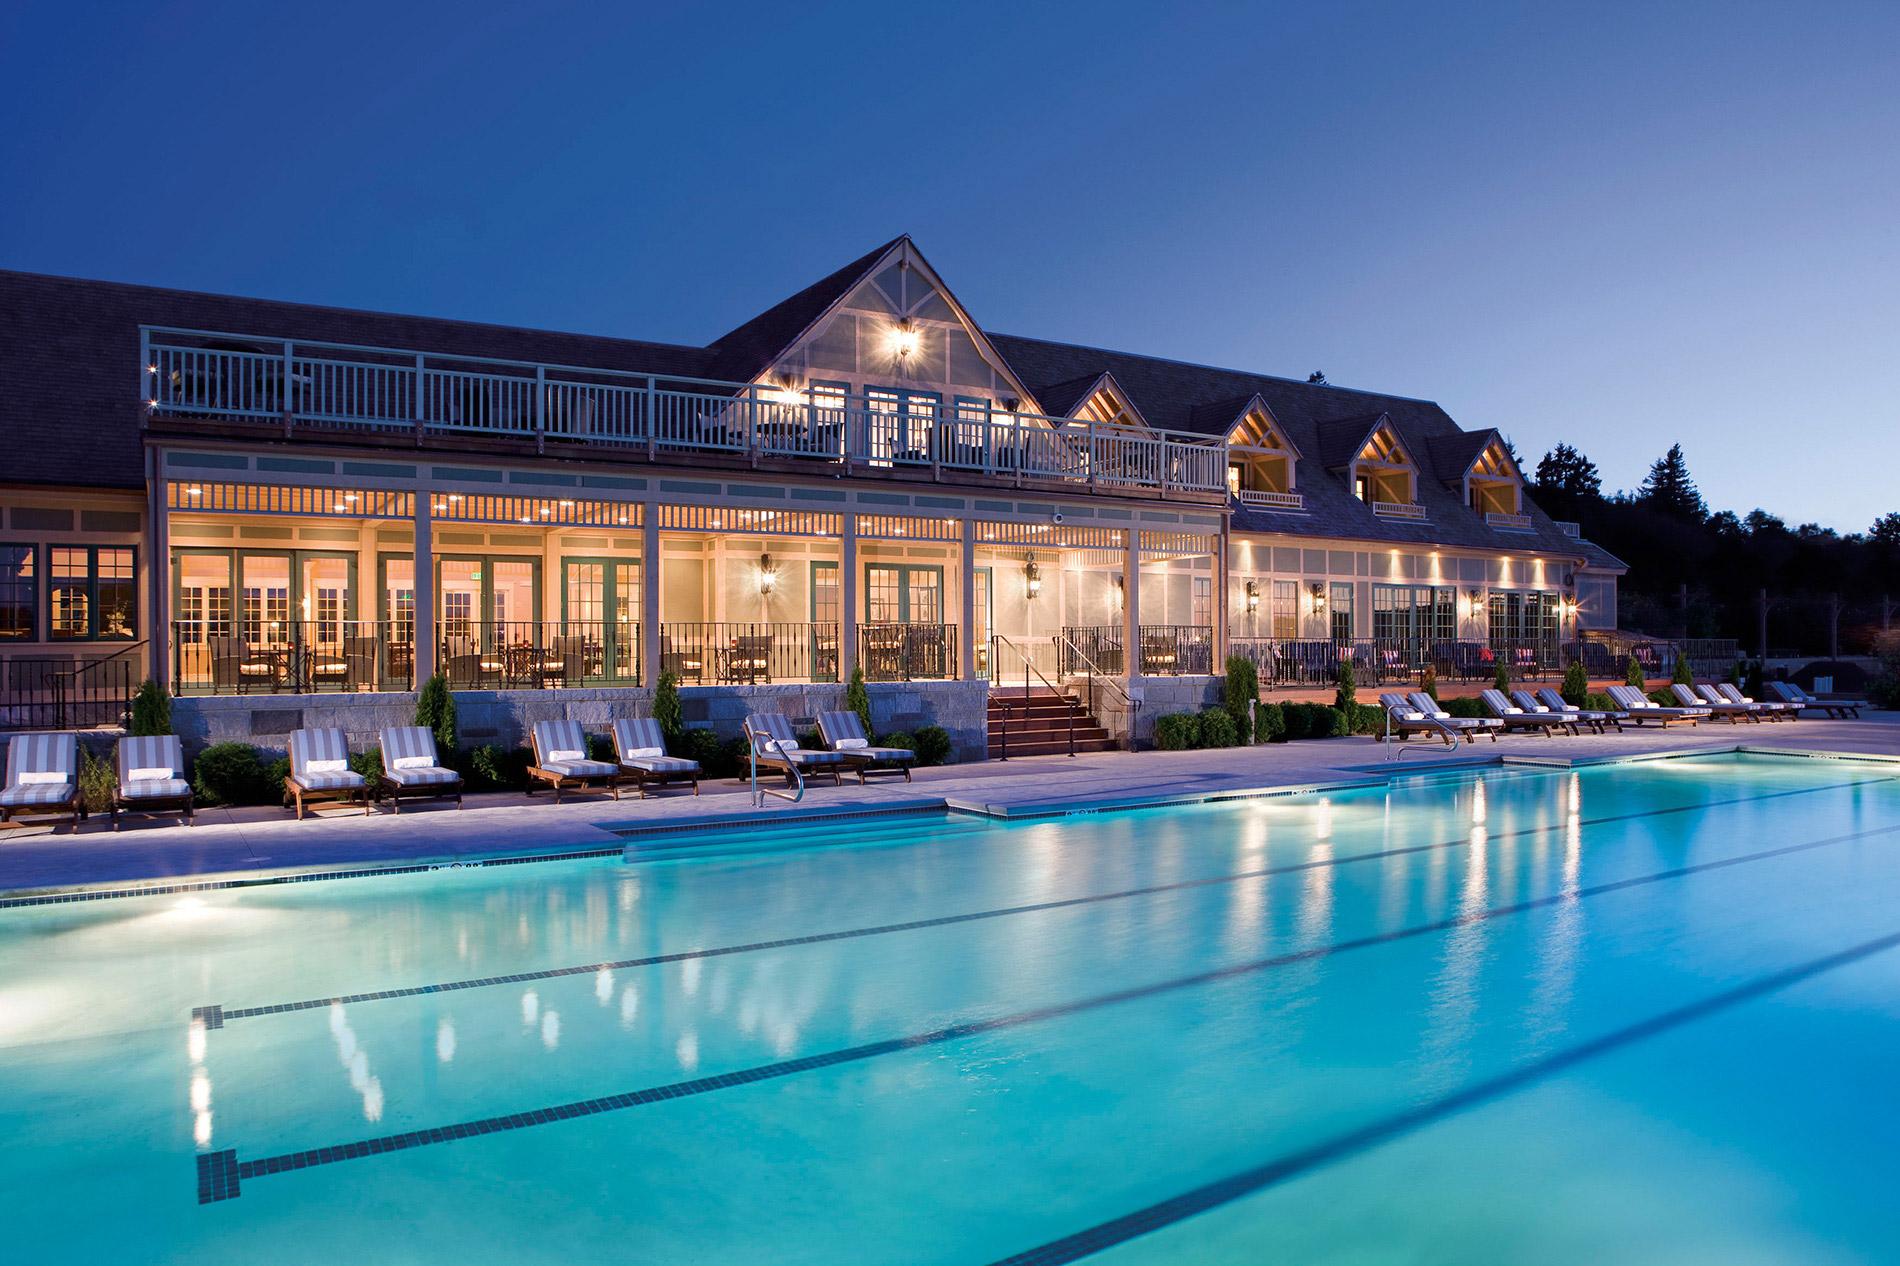 Bar Harbor Pool